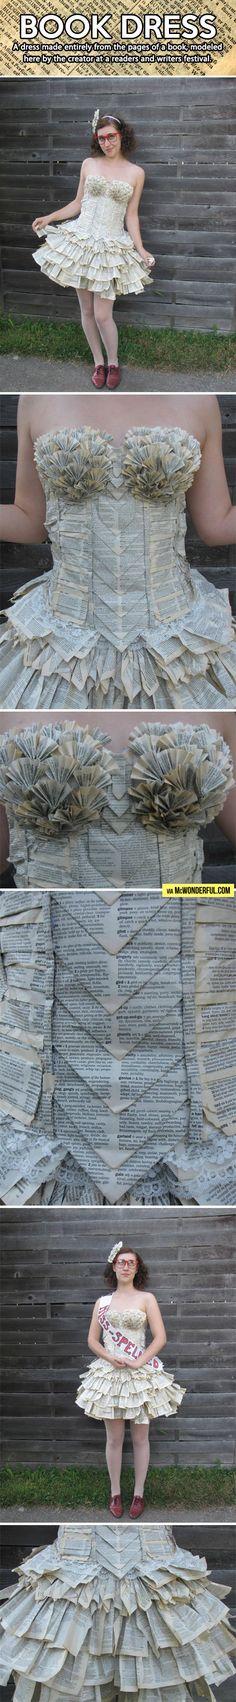 The book dress.